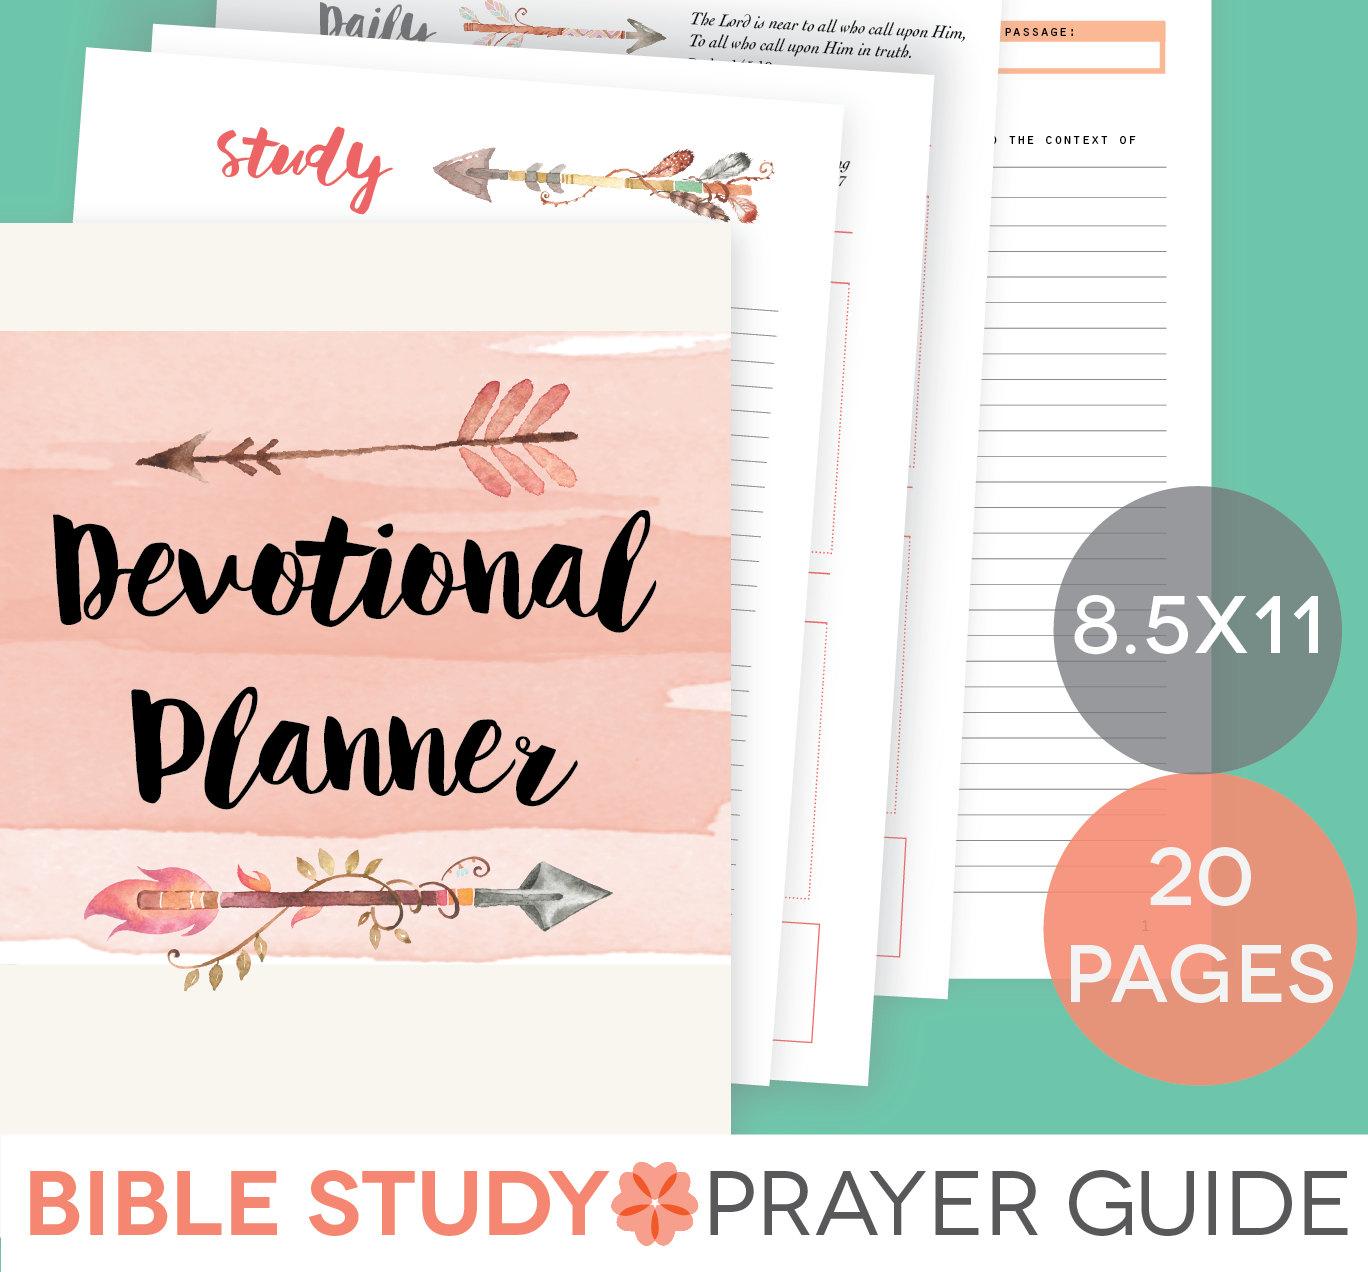 Daily Devotionals and Bible Devotions - Crosswalk.com